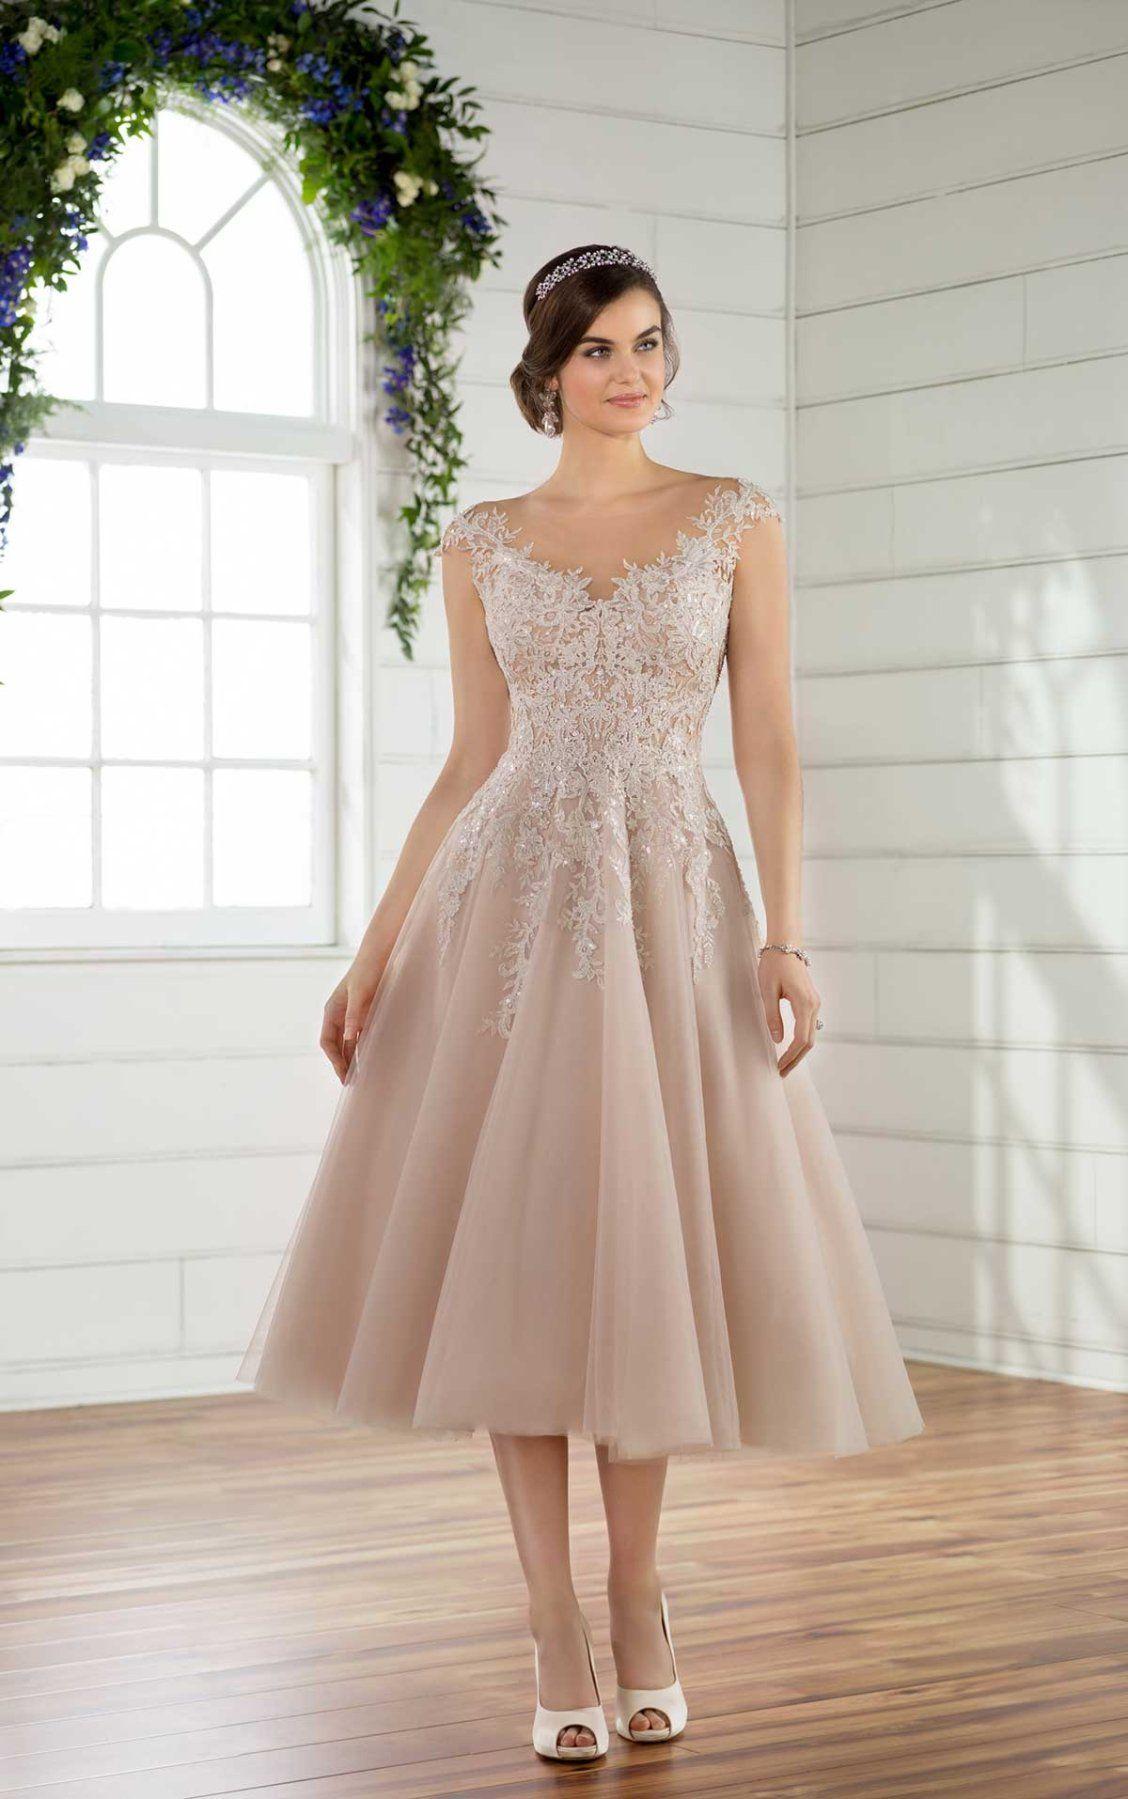 Short And Sweet Wedding Dress Short Lace Wedding Dress Essense Of Australia Wedding Dresses Sweet Wedding Dresses